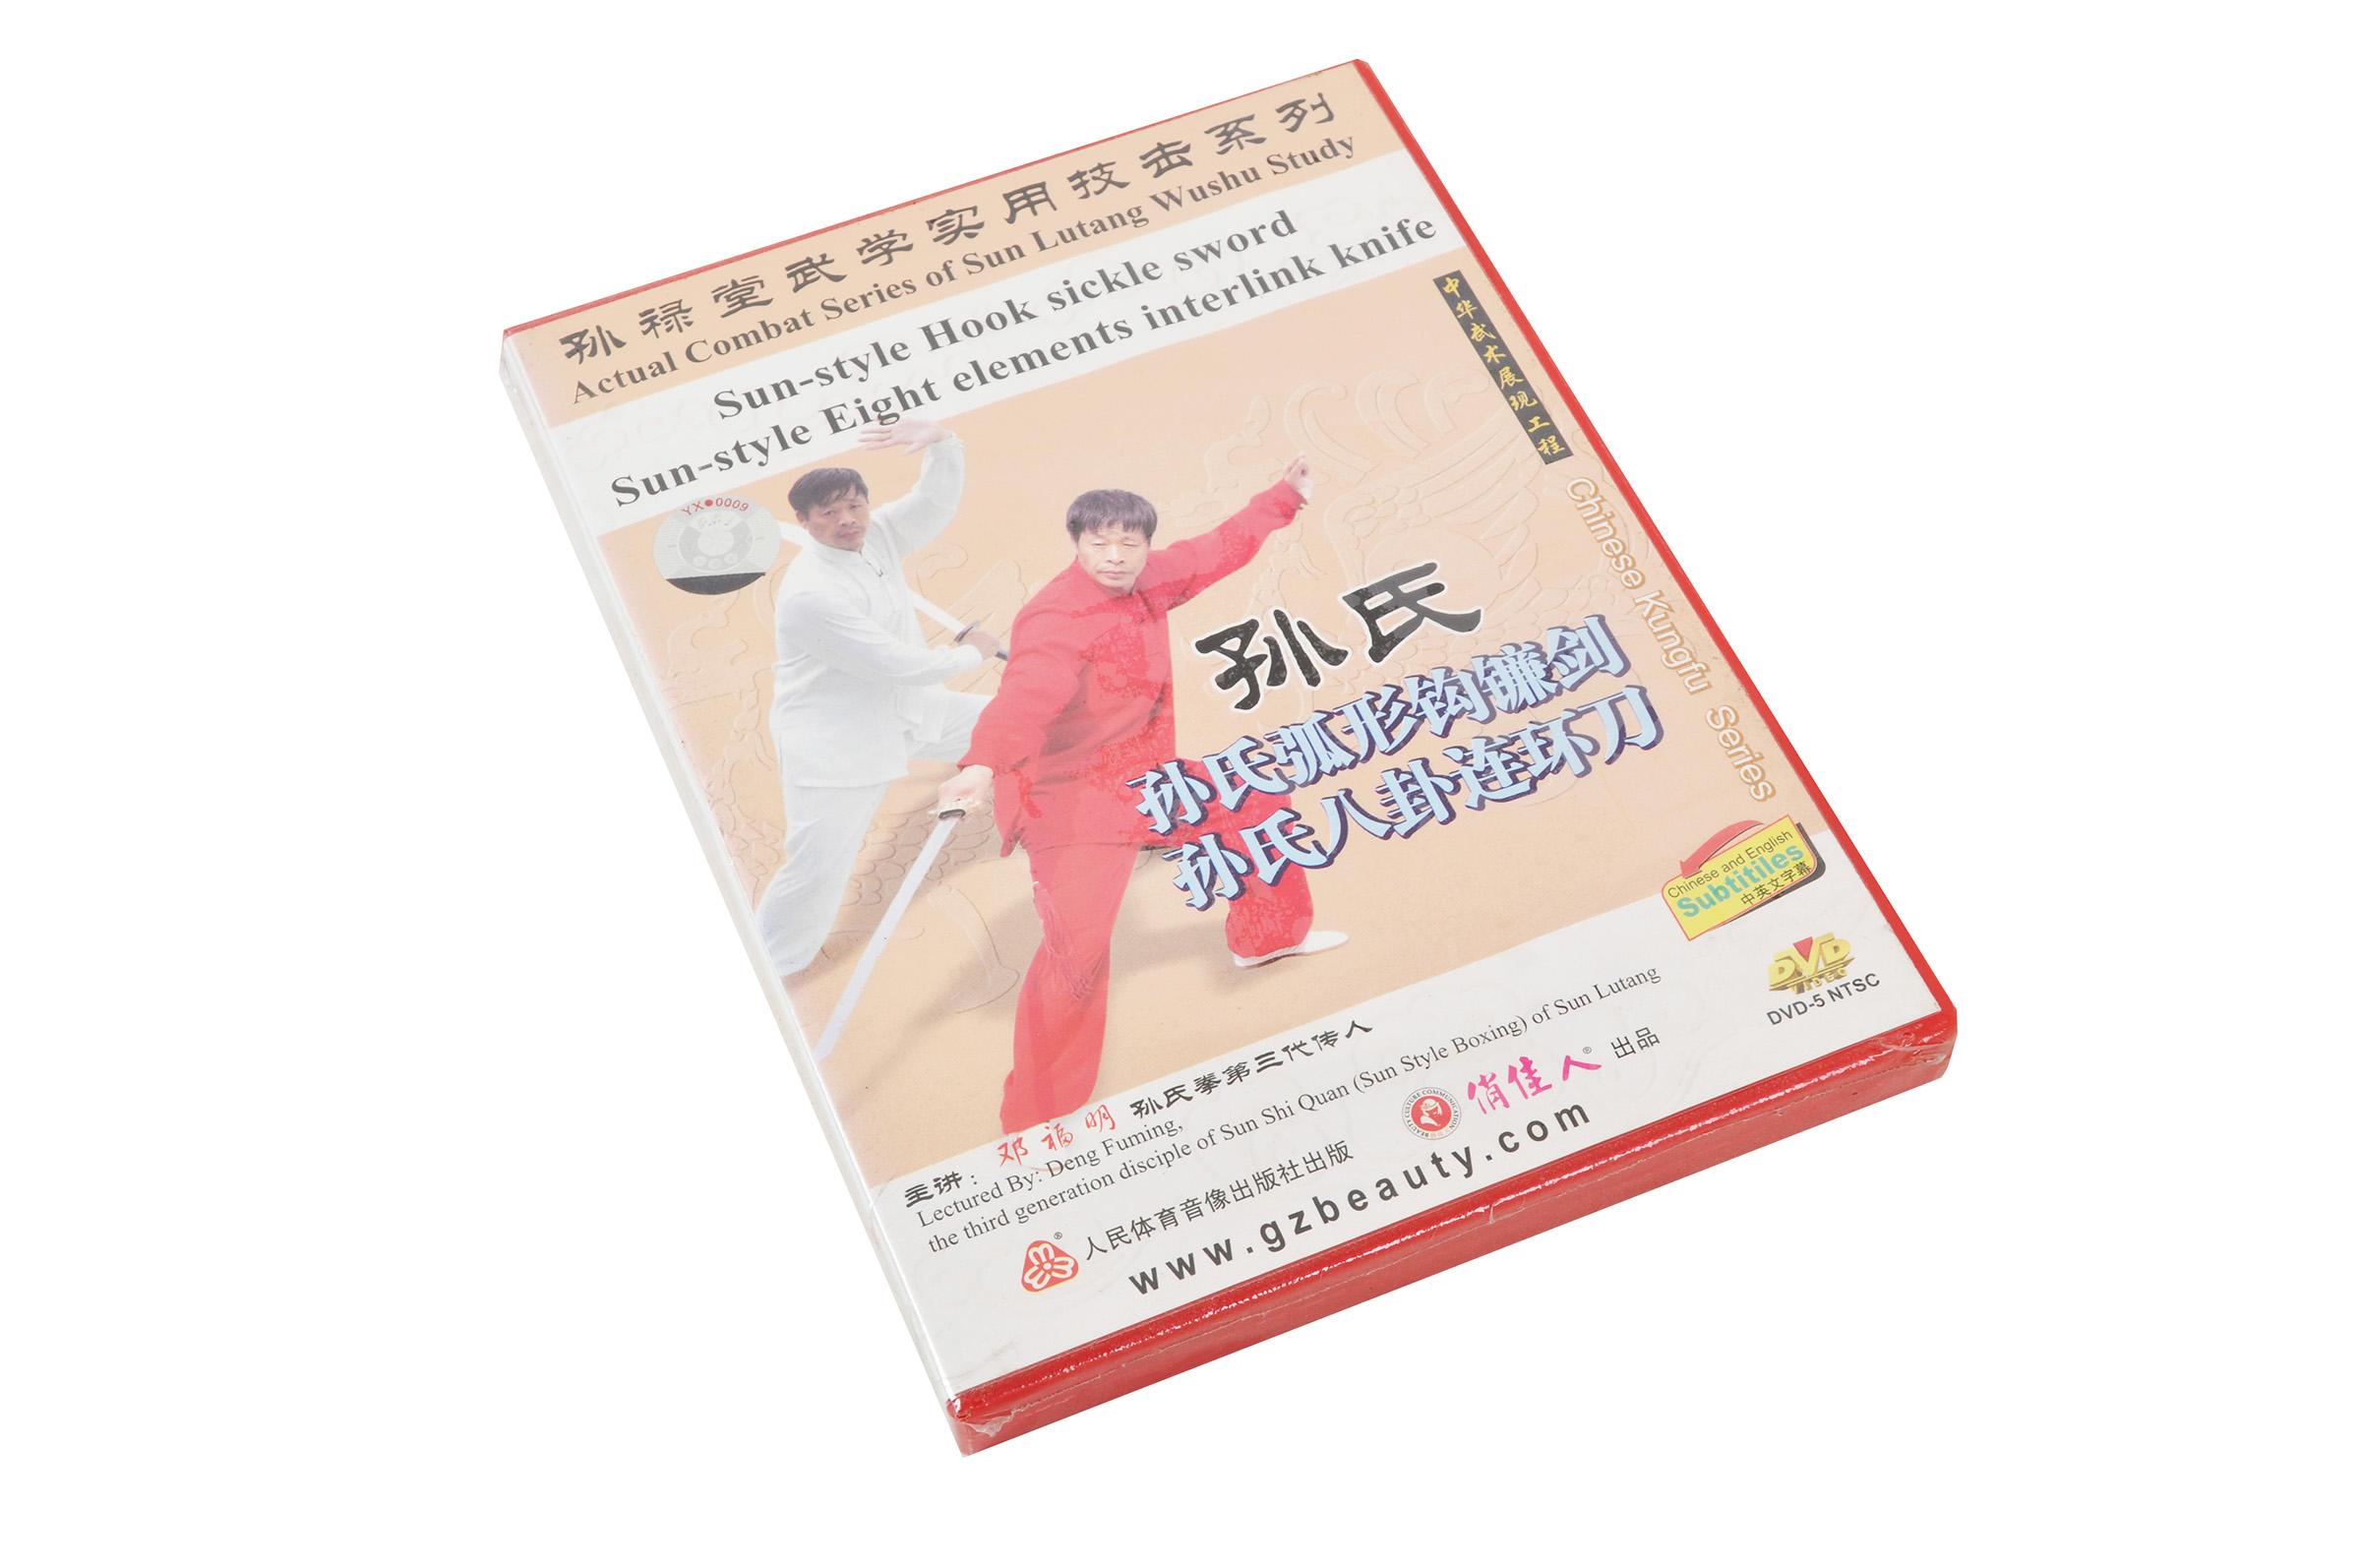 [DVD] Sabre crochet Bagua